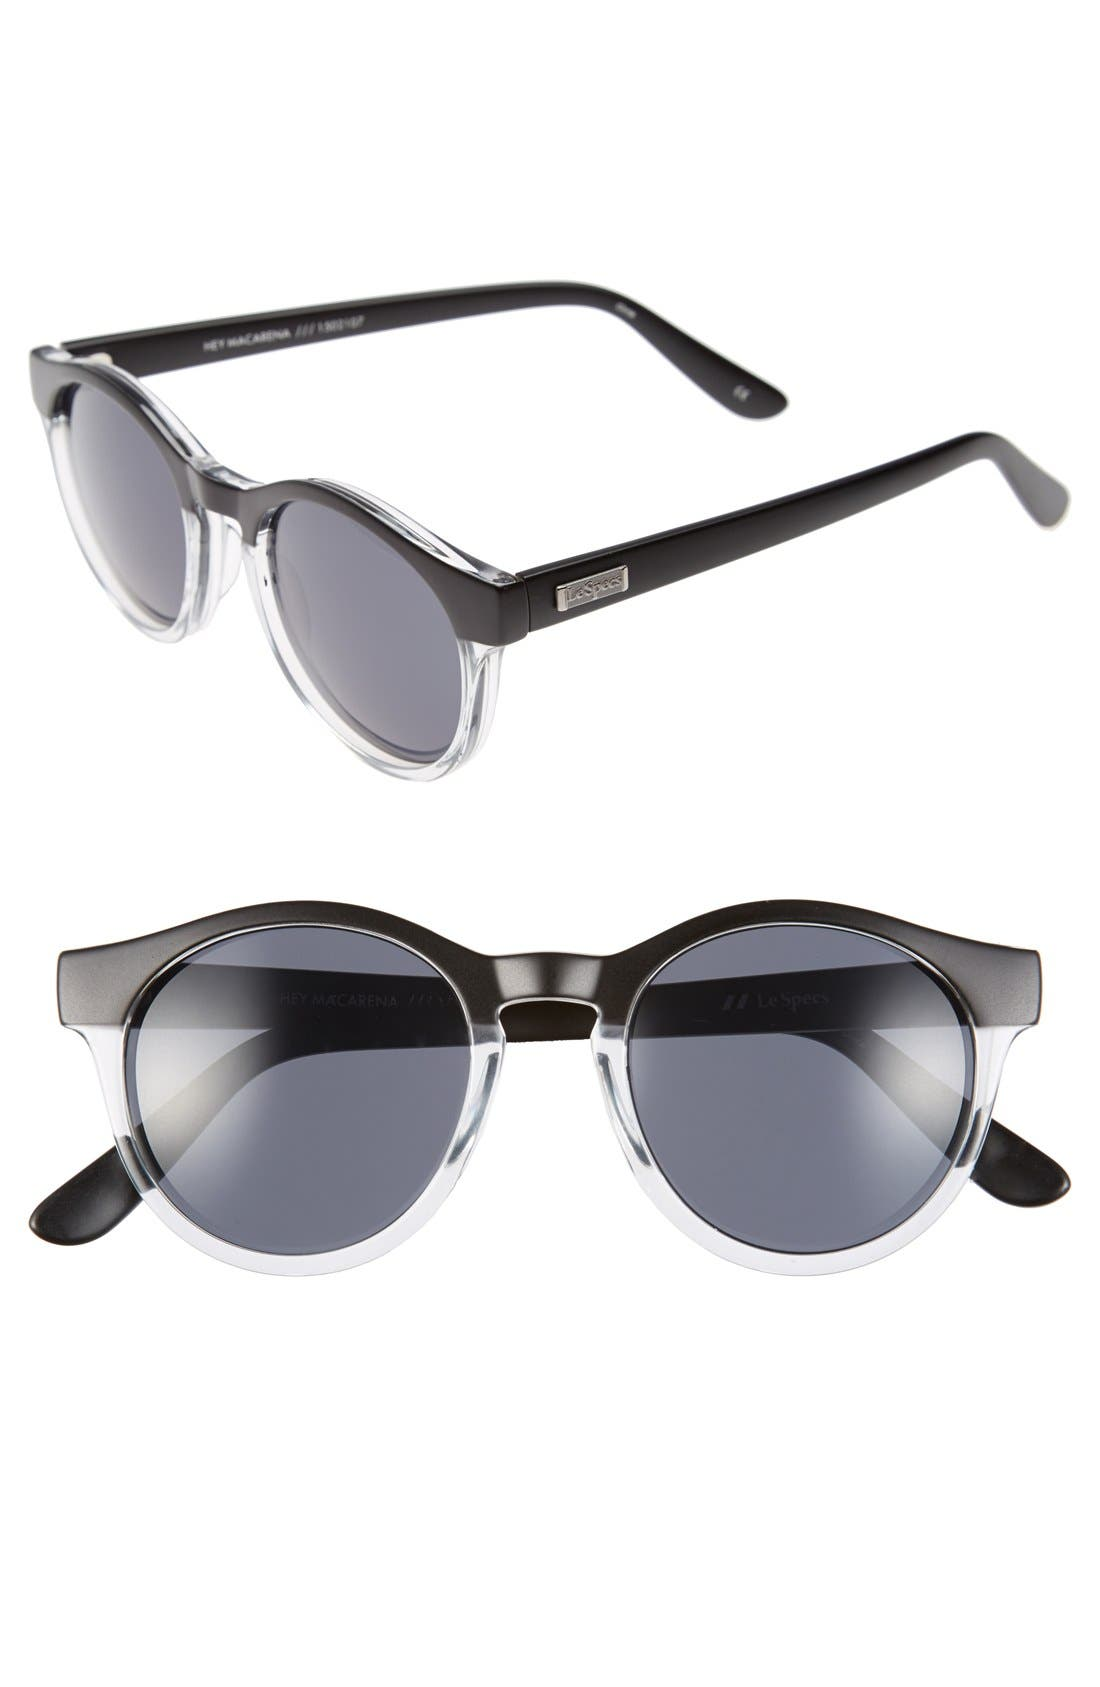 Main Image - Le Specs 'Hey Macarena' 51mm Round Sunglasses